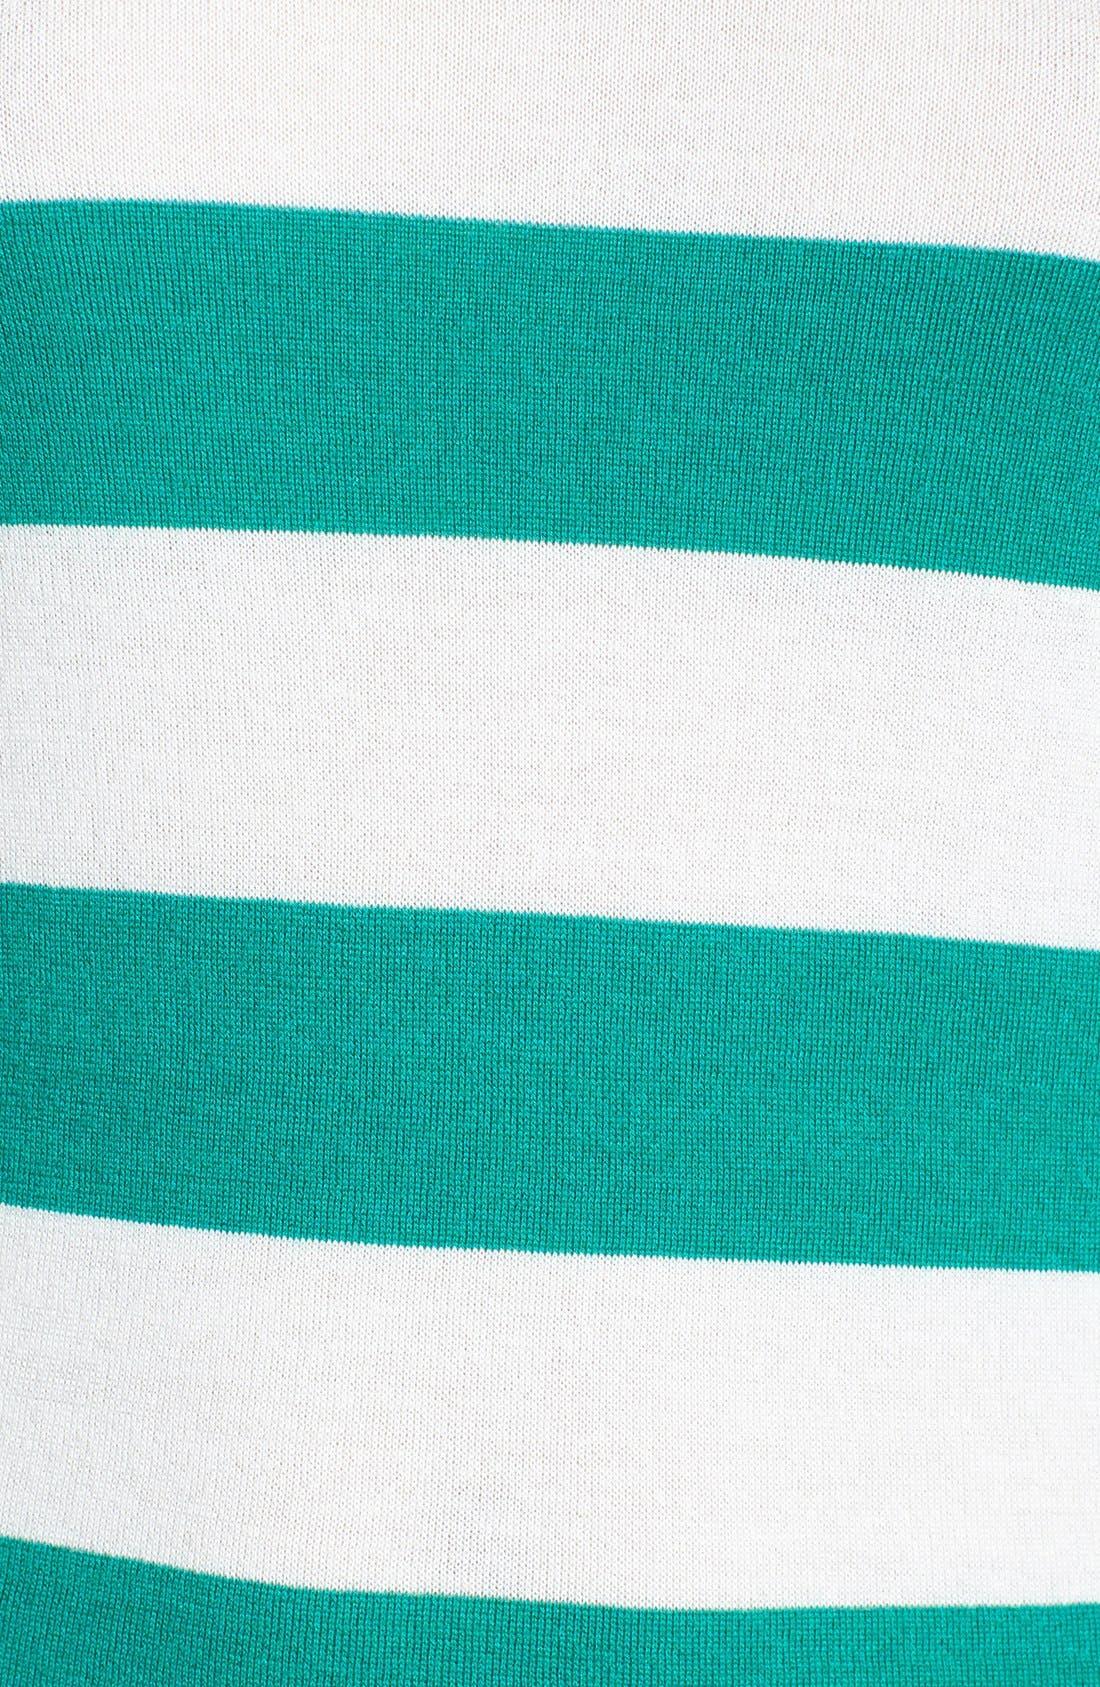 Alternate Image 3  - Equipment 'Violet' Stripe Cashmere Blend Sweater